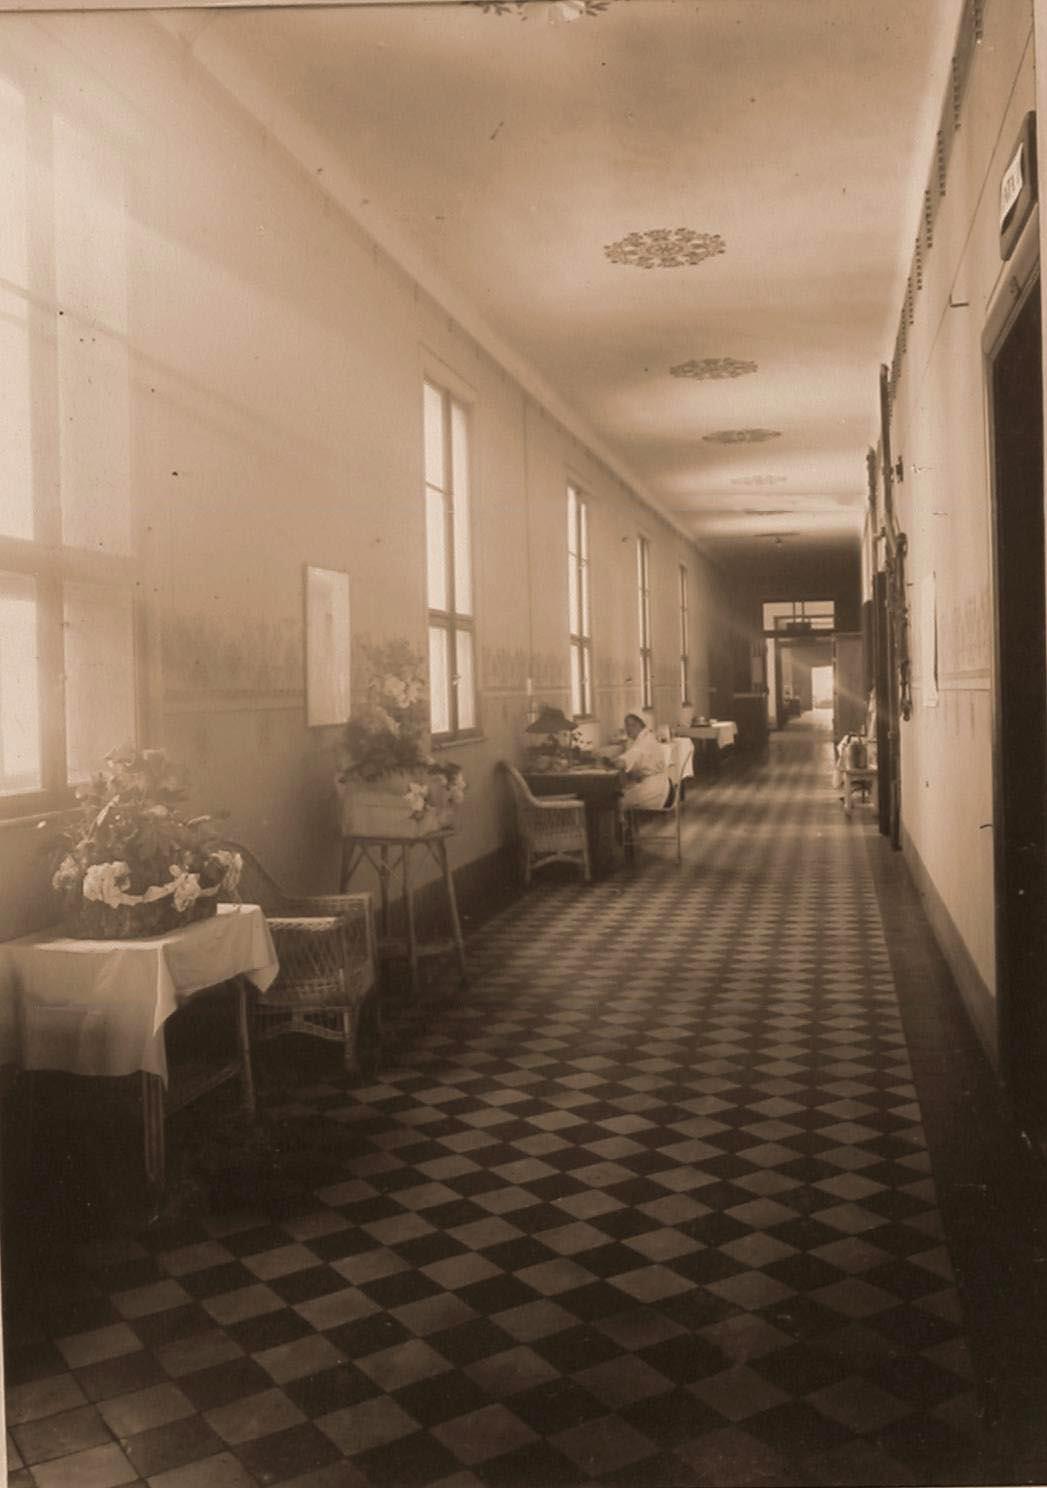 05. Вид части коридора III этажа госпиталя